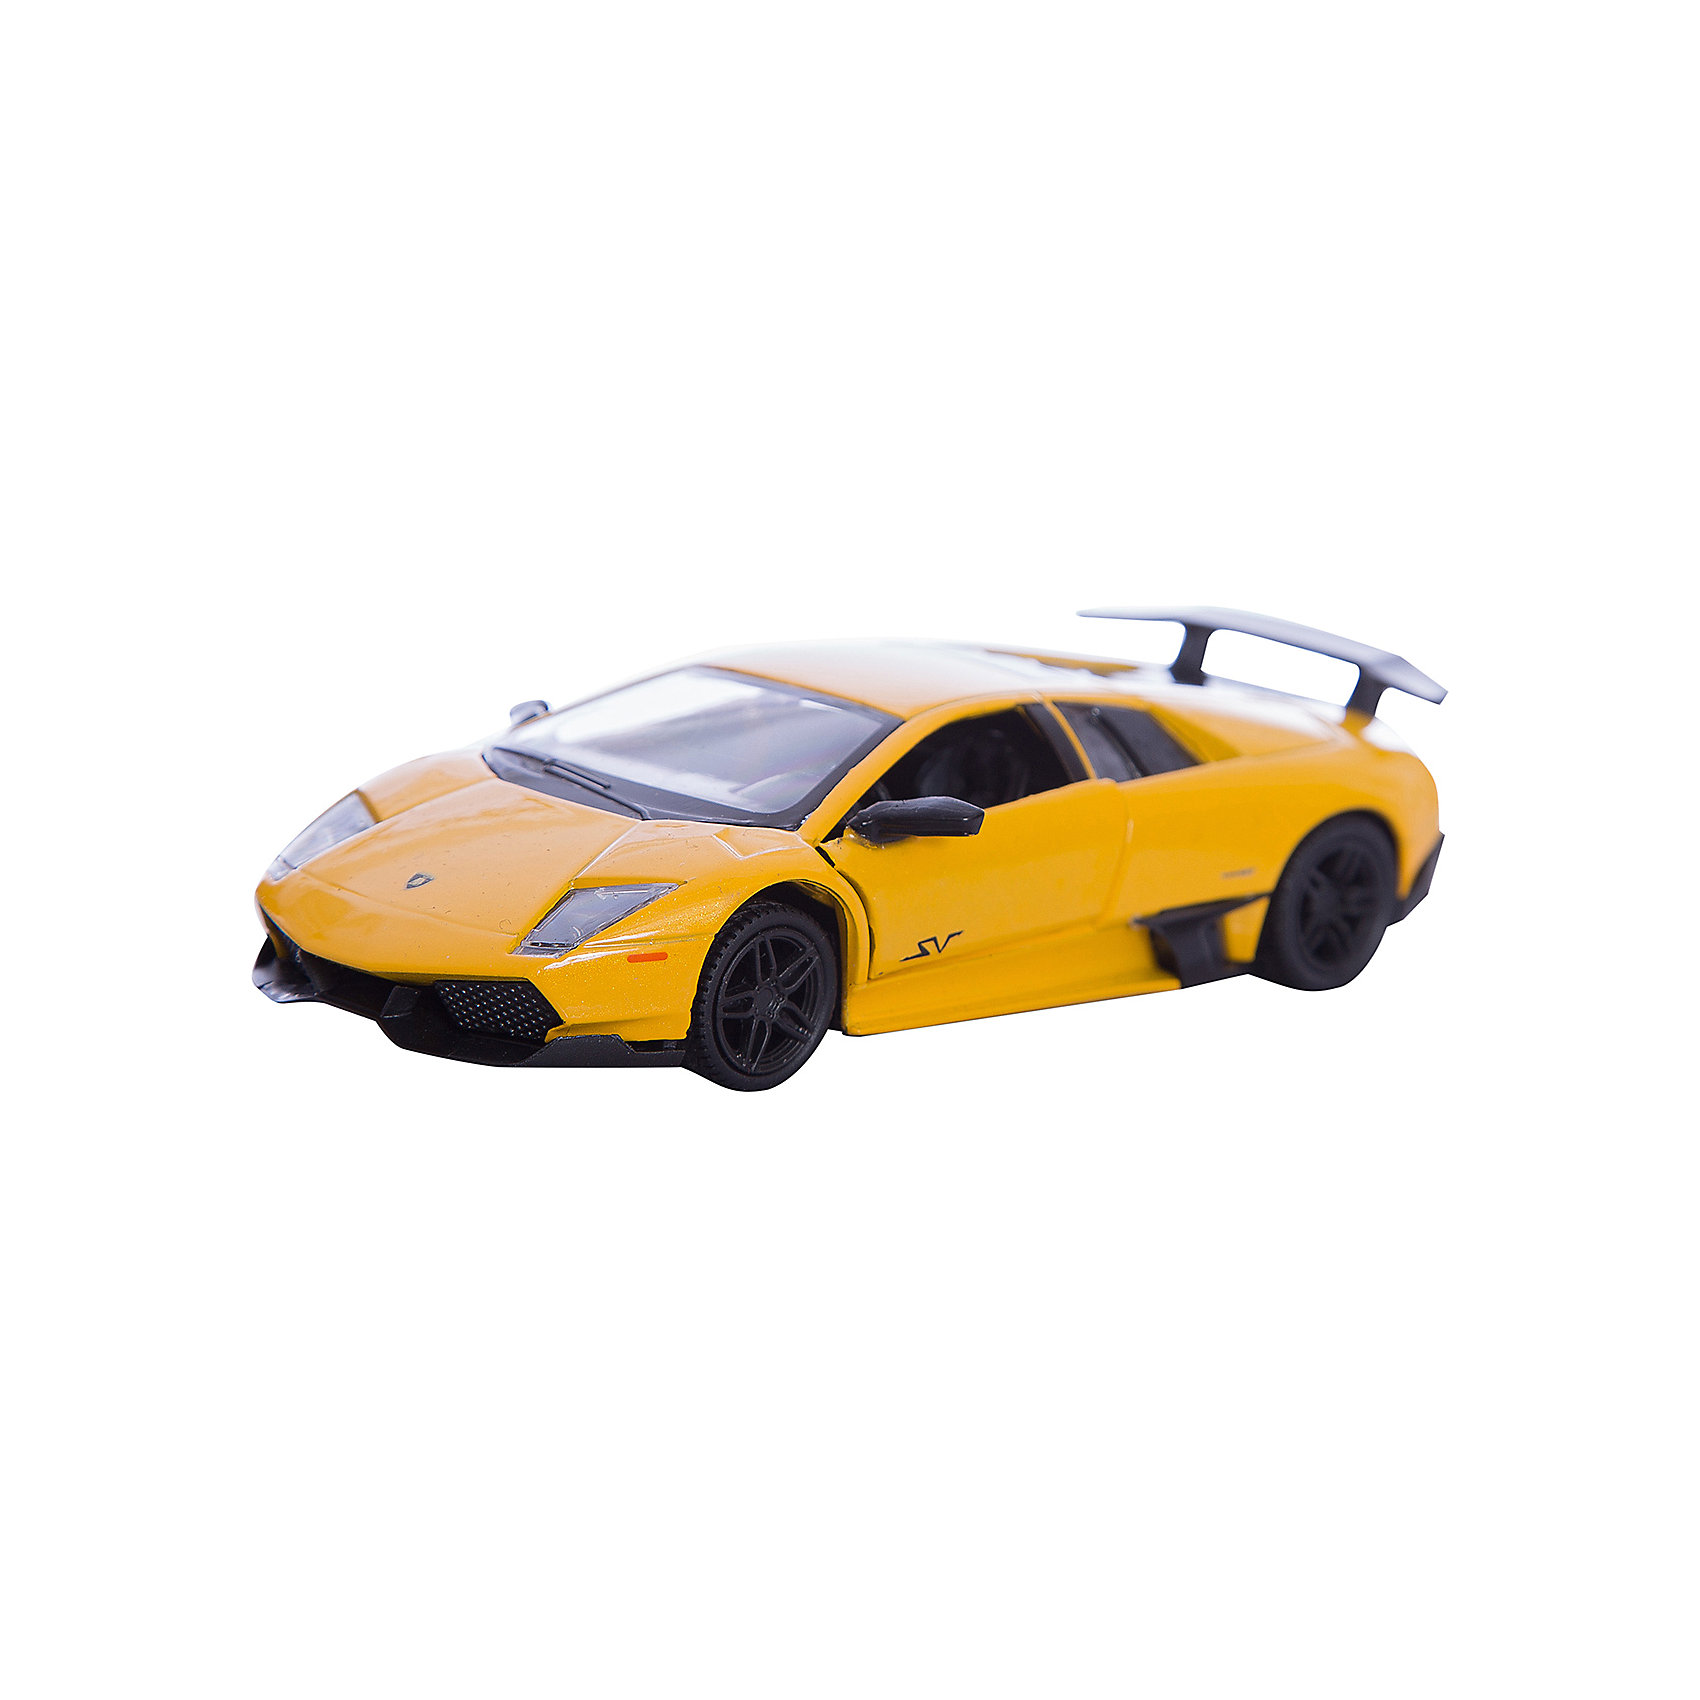 Машинка Lamborghini Murcielago LP670-4 SV 5, AutotimeМашинки<br><br><br>Ширина мм: 165<br>Глубина мм: 57<br>Высота мм: 75<br>Вес г: 13<br>Возраст от месяцев: 36<br>Возраст до месяцев: 2147483647<br>Пол: Мужской<br>Возраст: Детский<br>SKU: 5584105